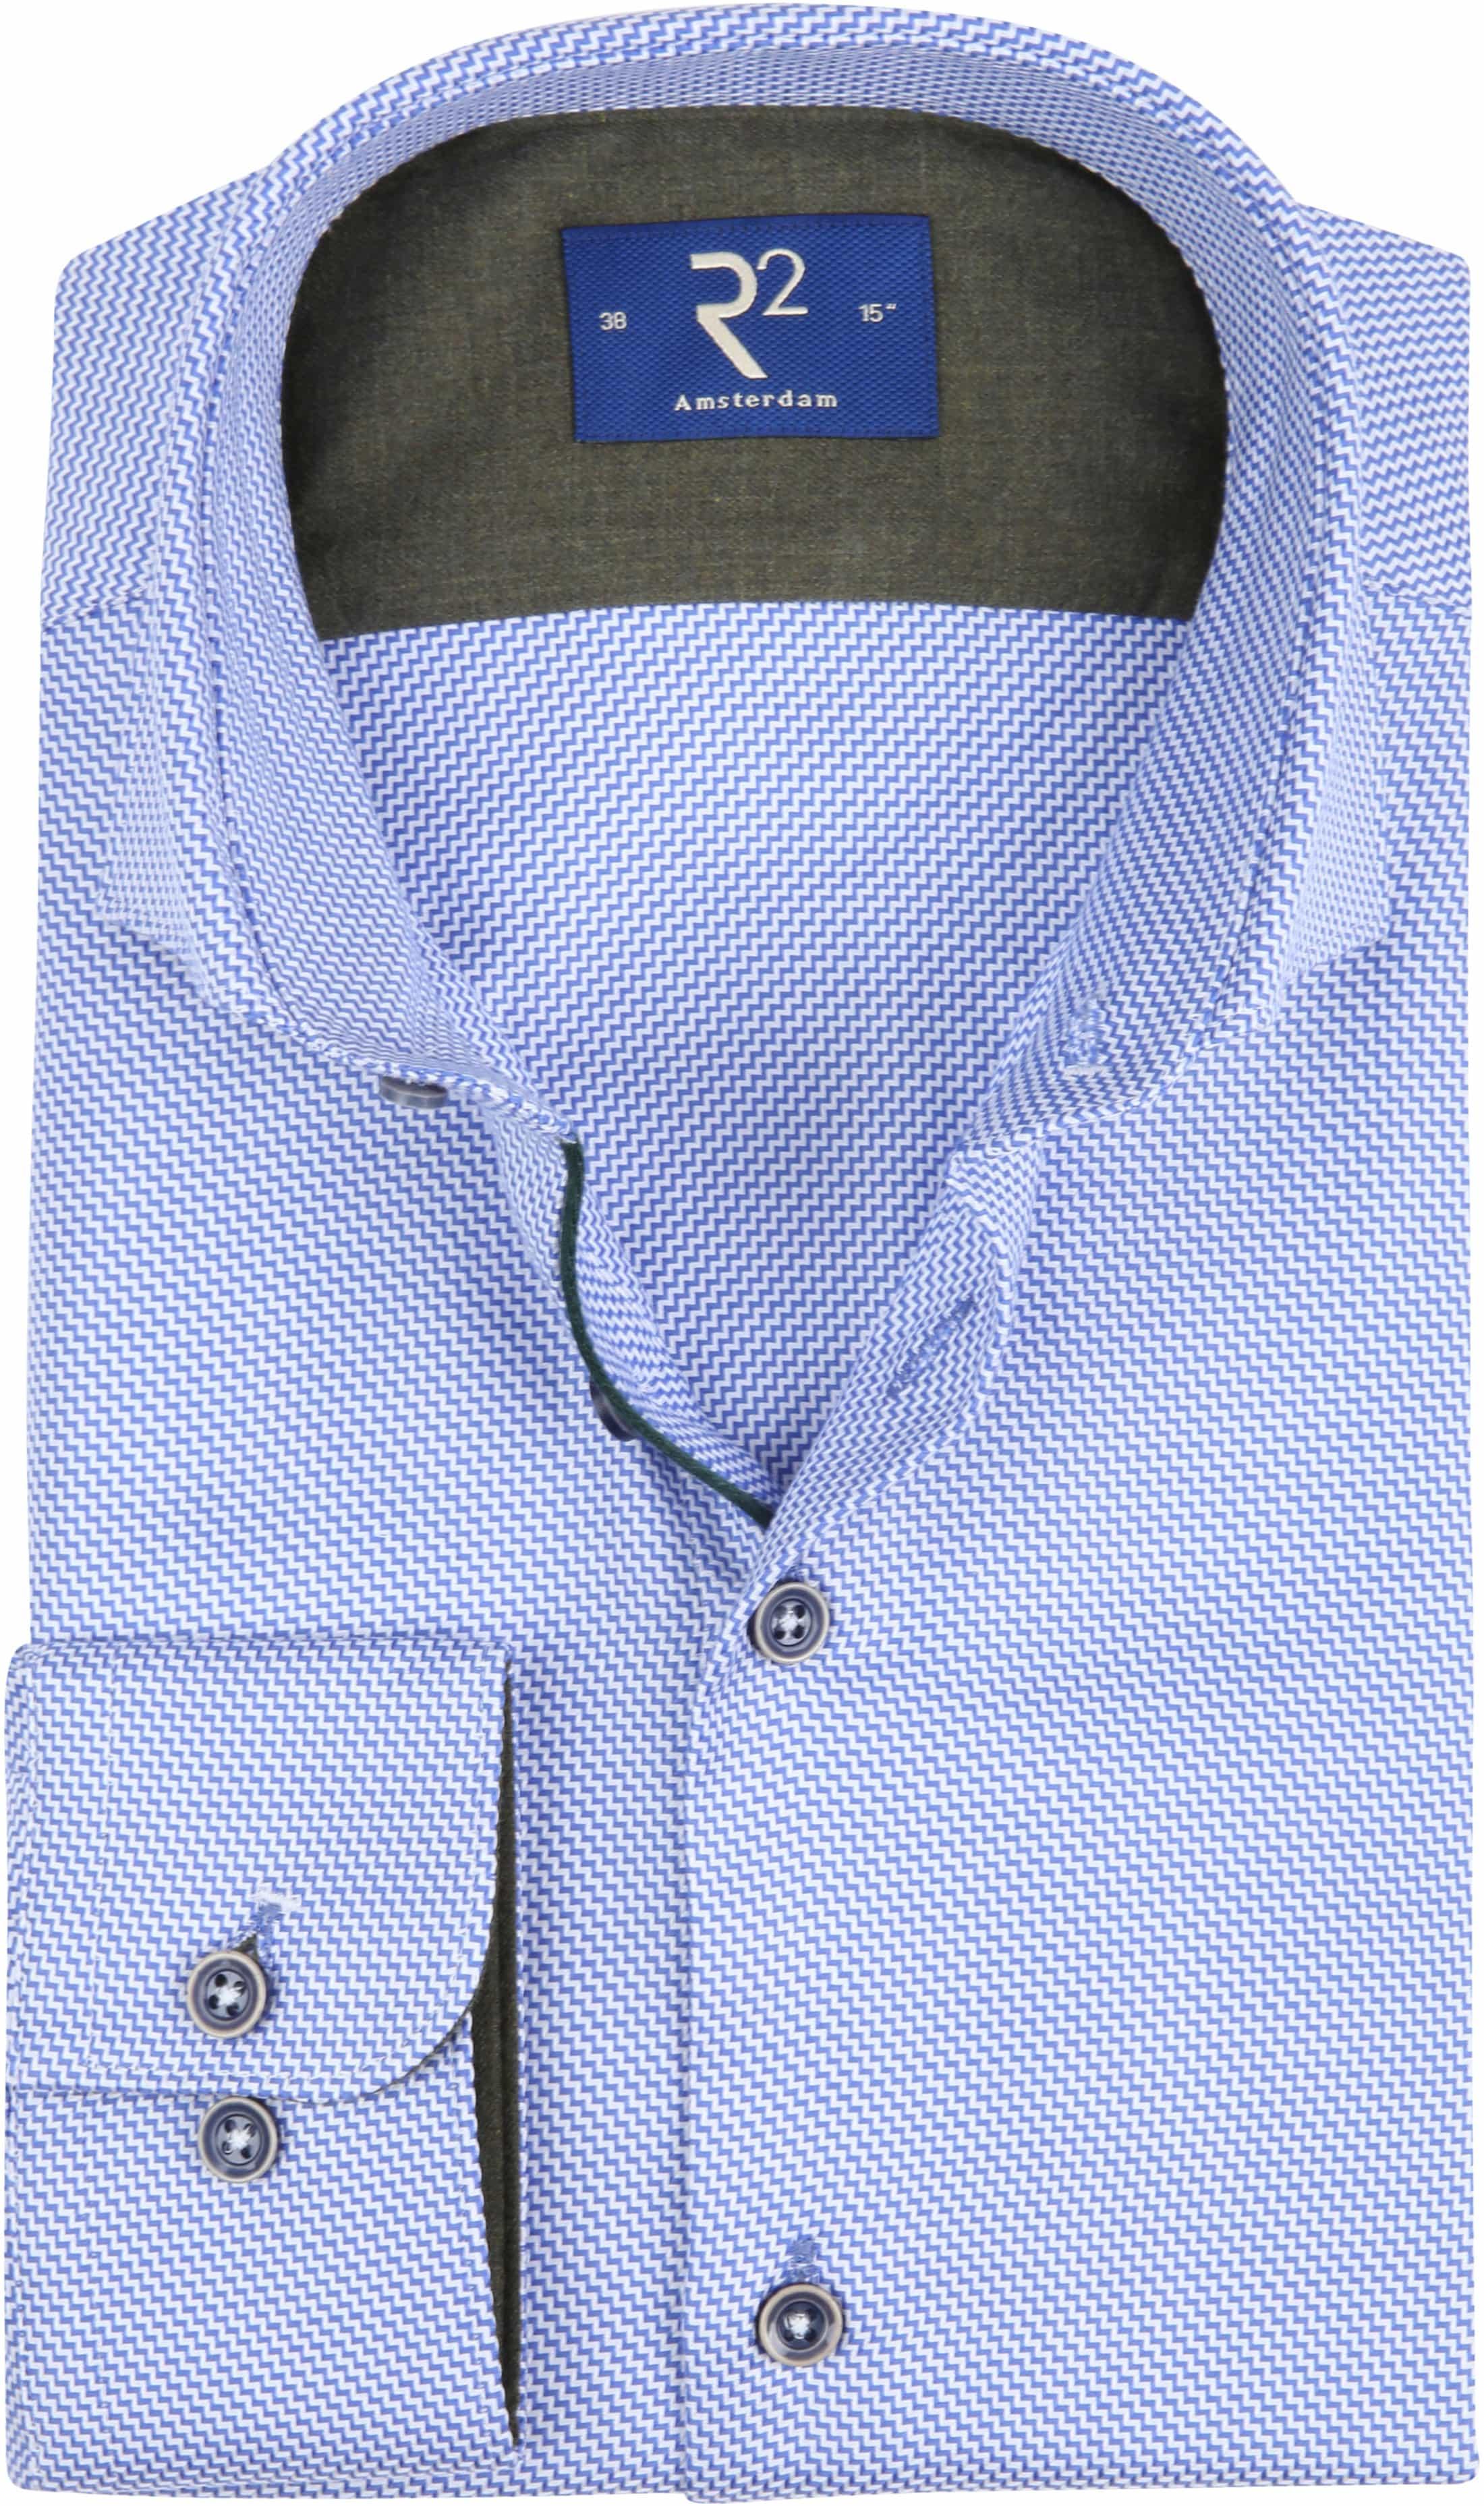 R2 Overhemd Blauw Wit Patroon foto 0